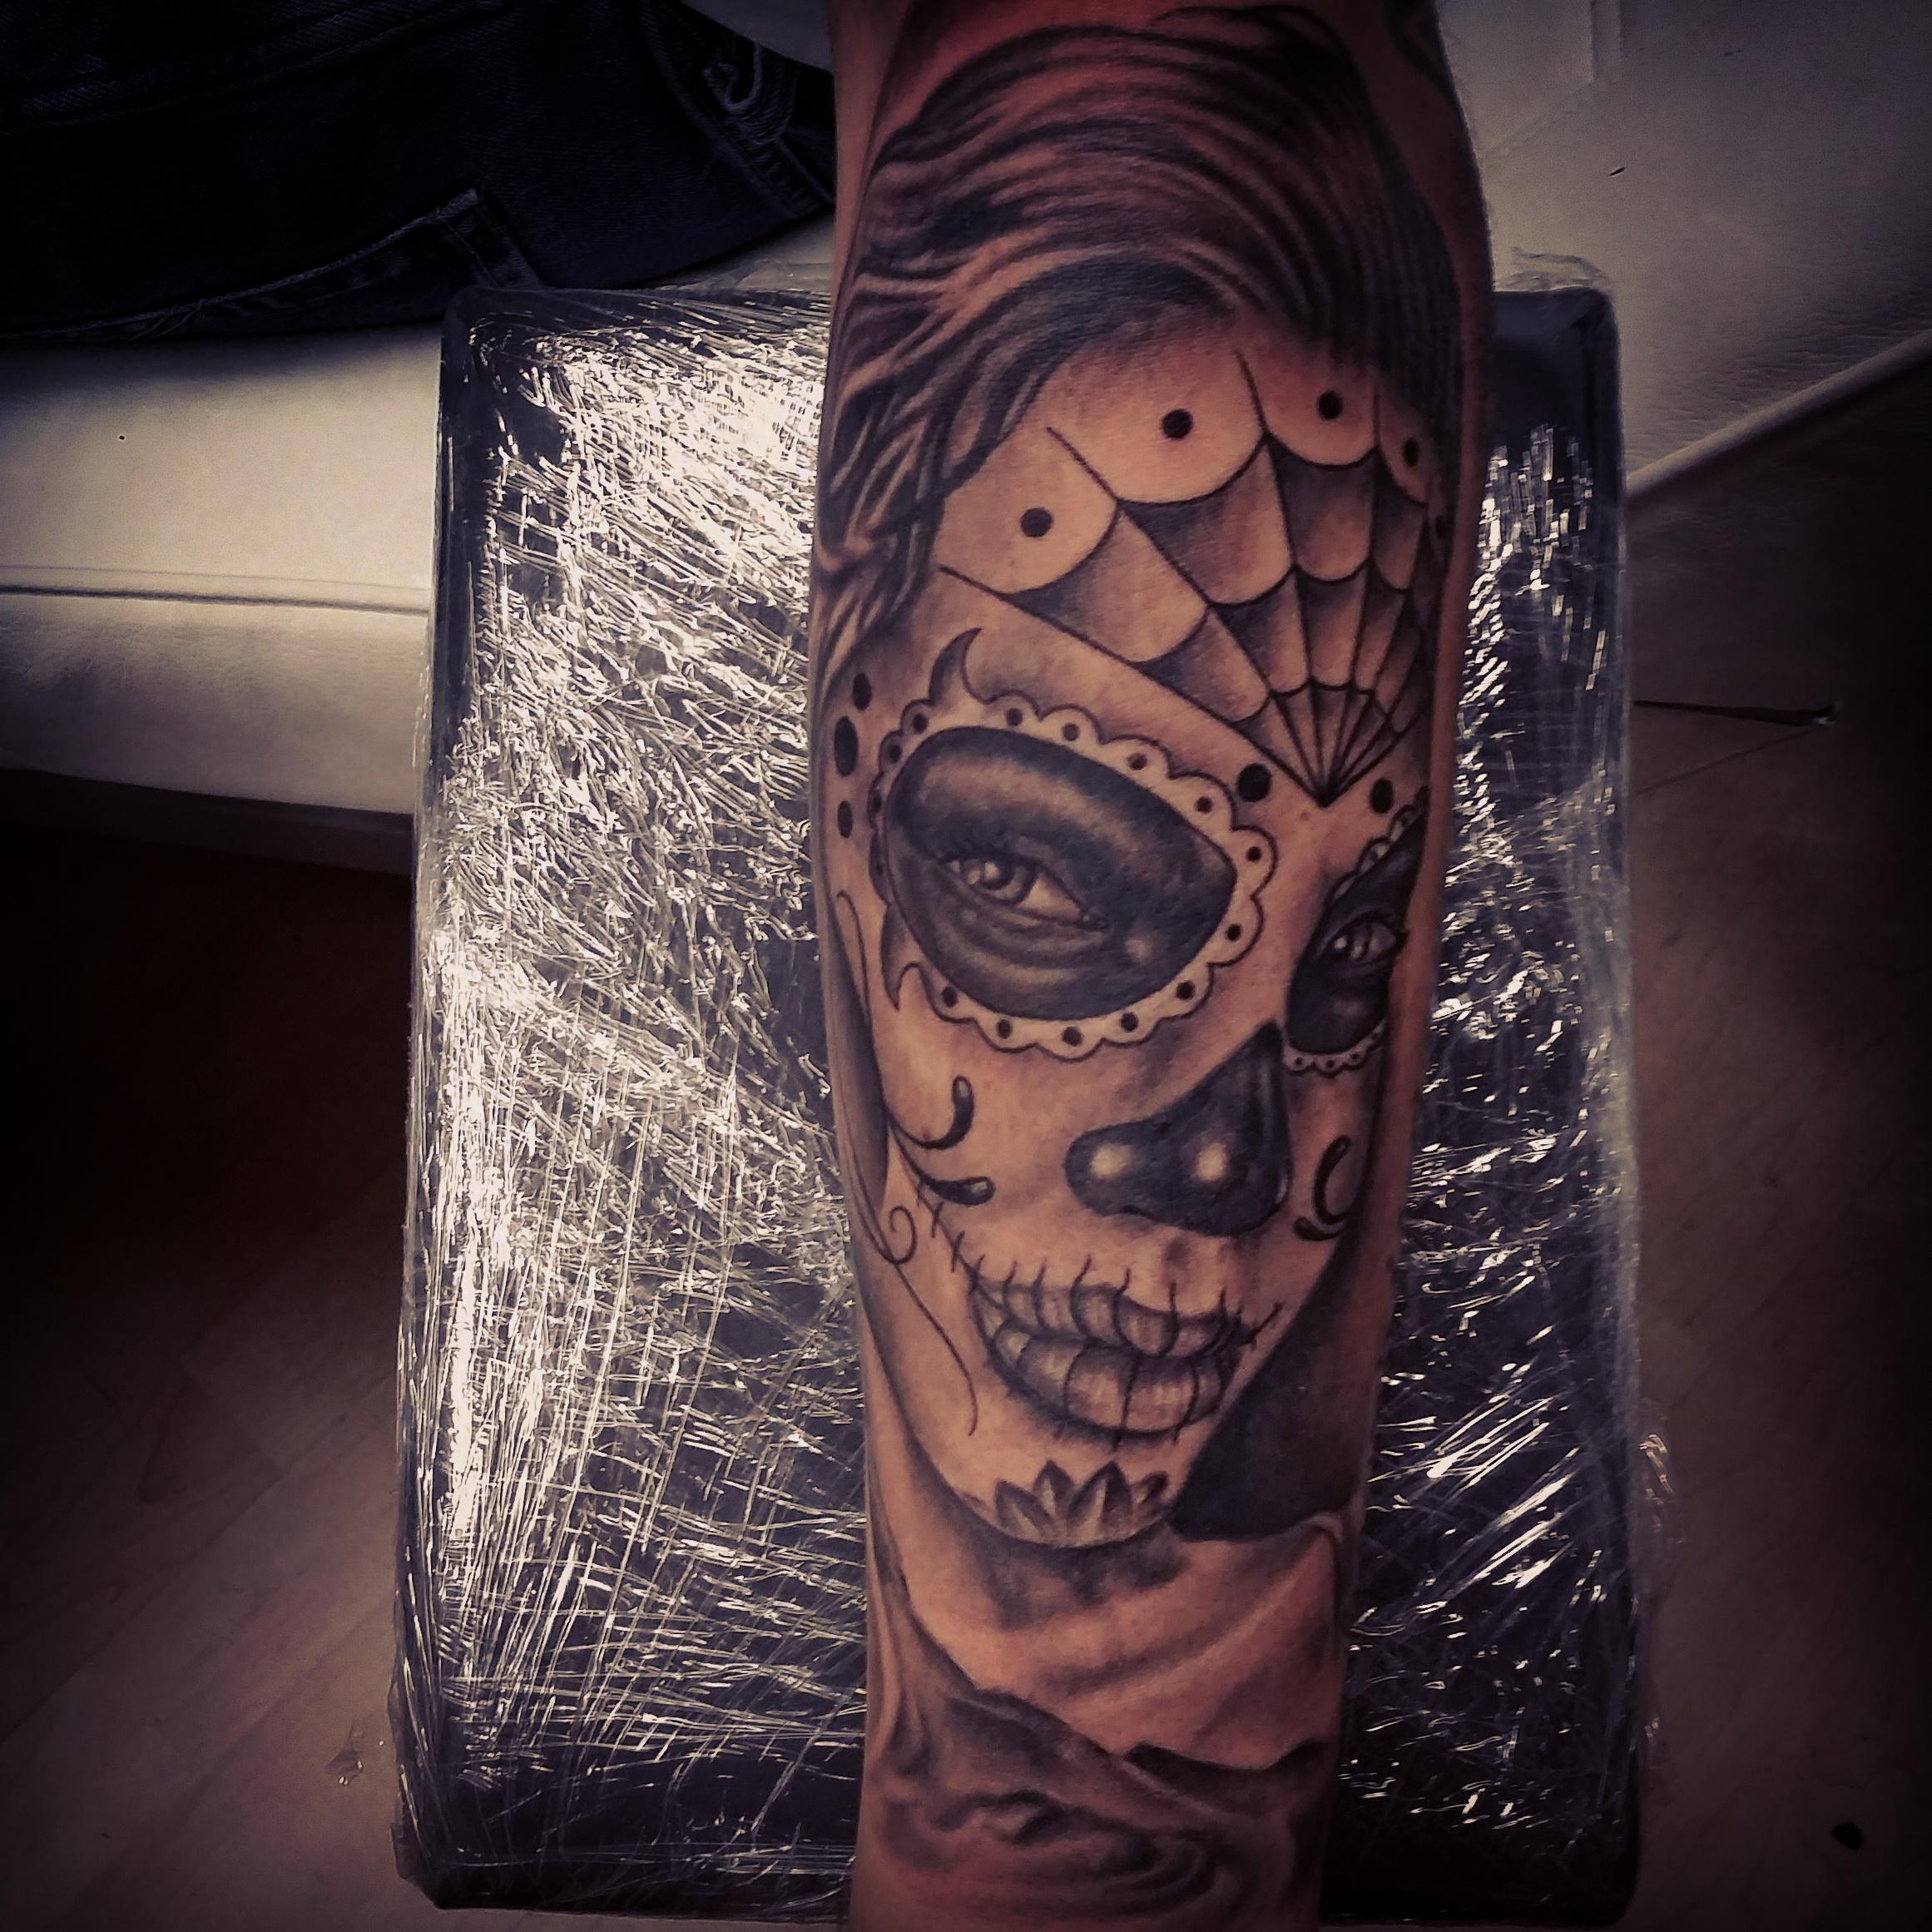 Calavera Tattoo Flash david pereira - certified artist